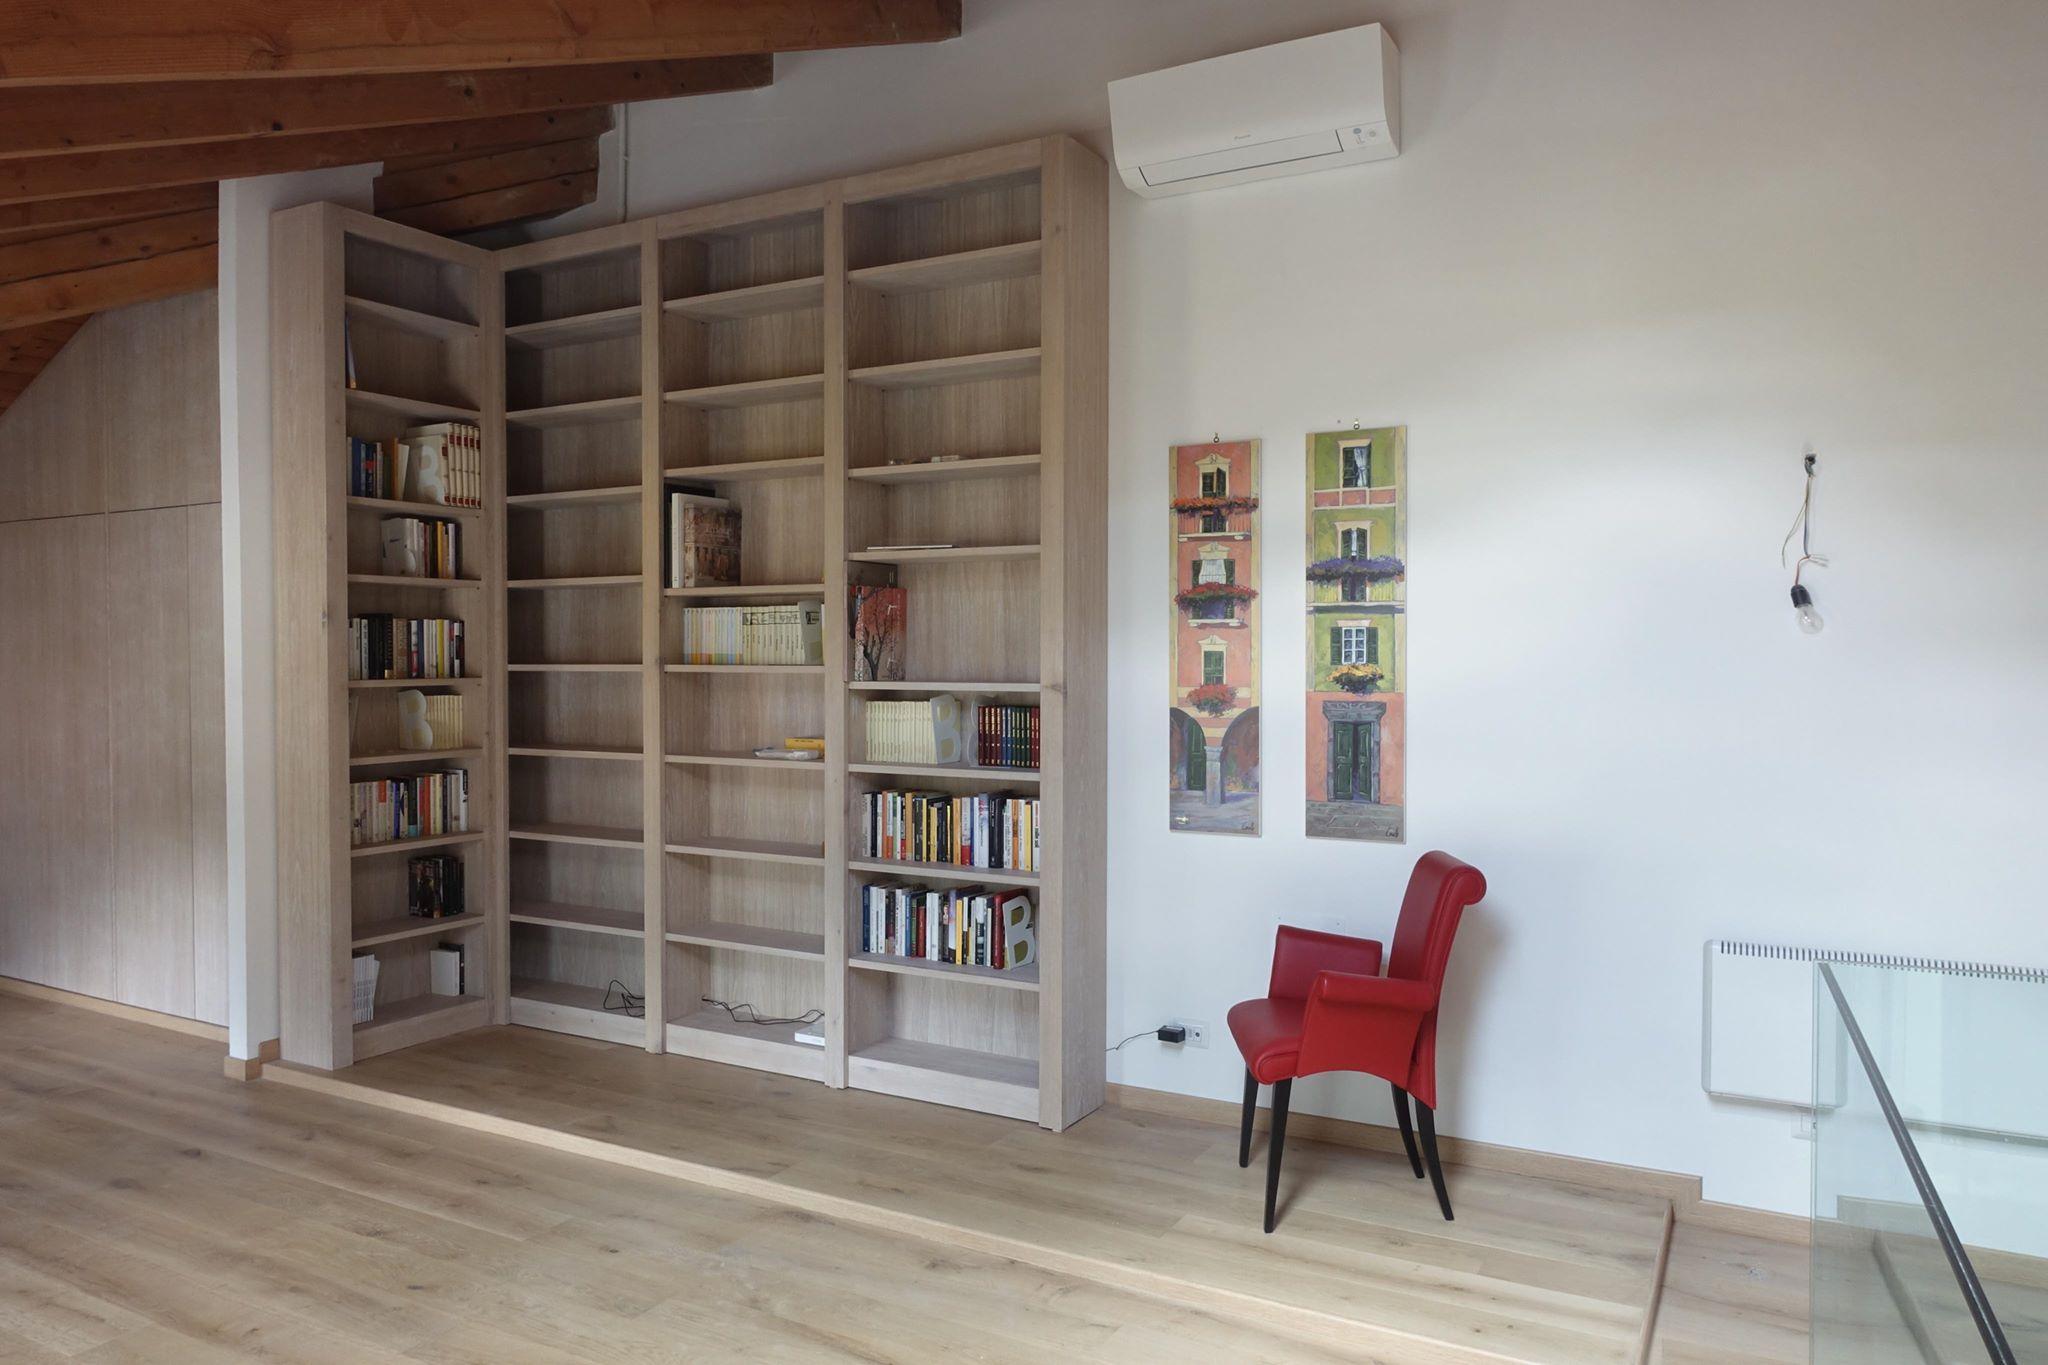 Armadio e libreria soggiorno mansardato mansarda lgnoeoltre